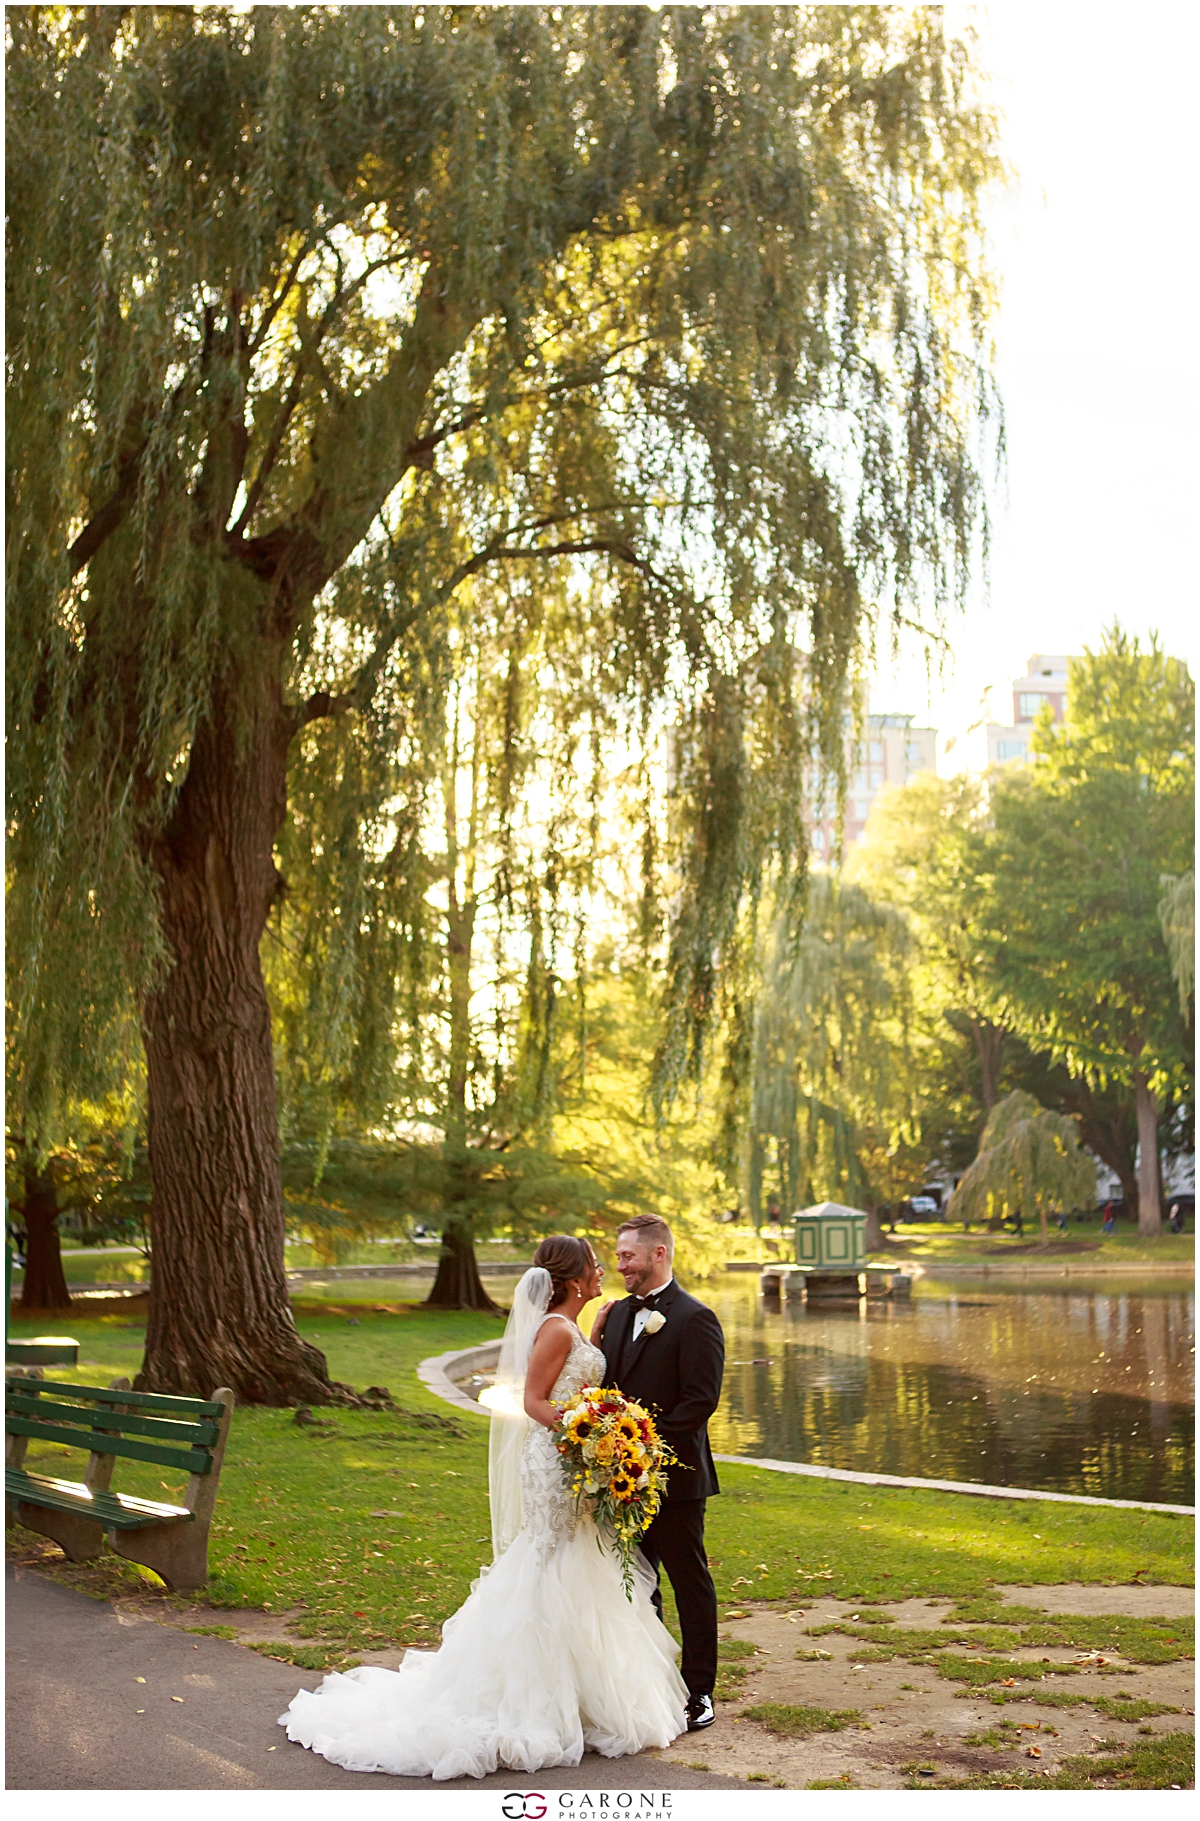 Erika_Eric_THe_State_Room_Boston_Wedding_Photography_Garone_Photography_Boston_Wedding_Photography_0020.jpg